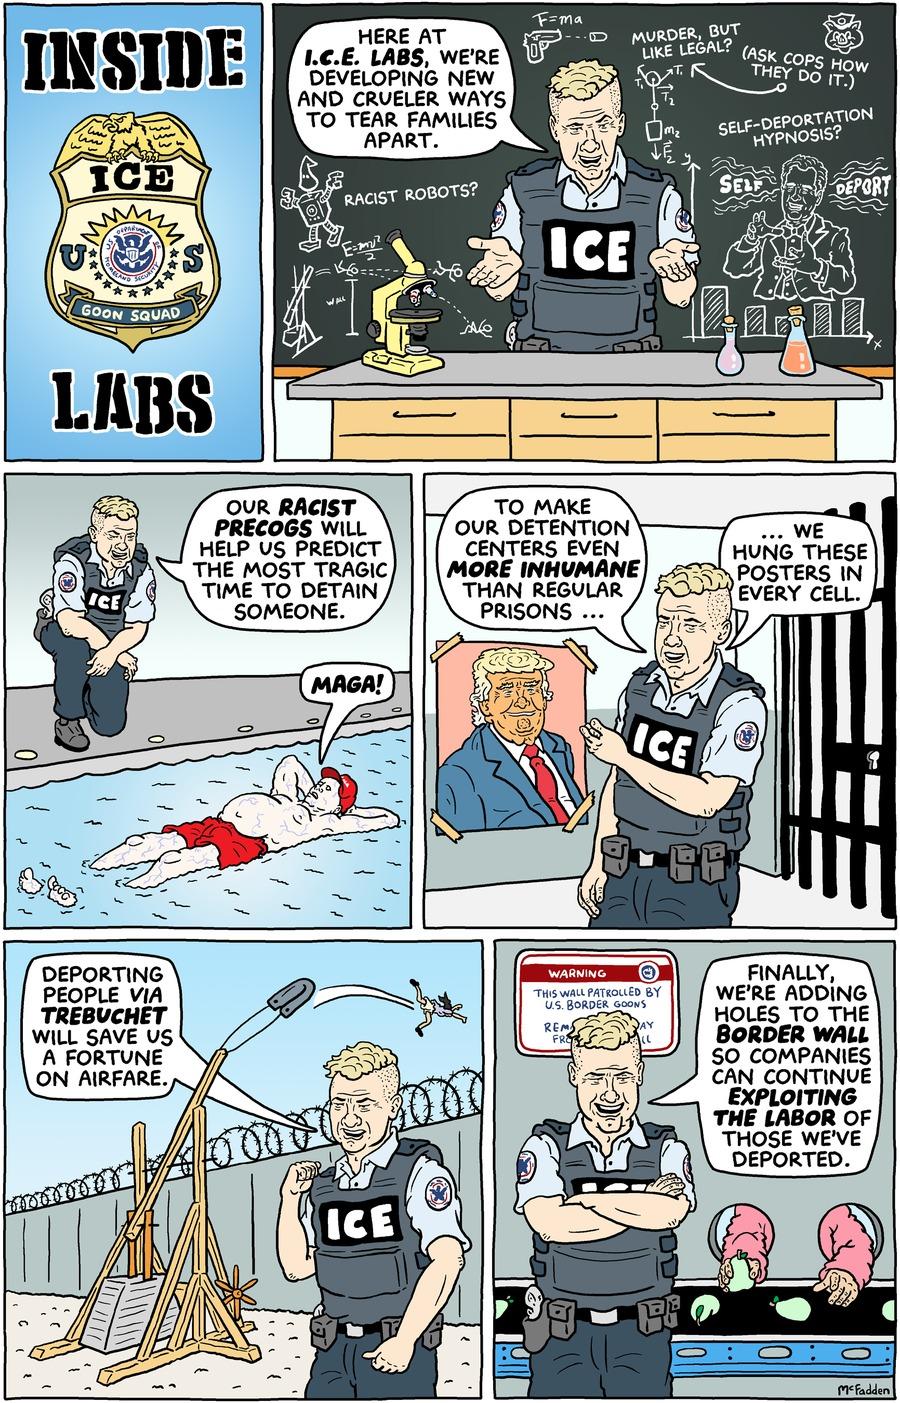 Brian McFadden for Jan 21, 2018 Comic Strip